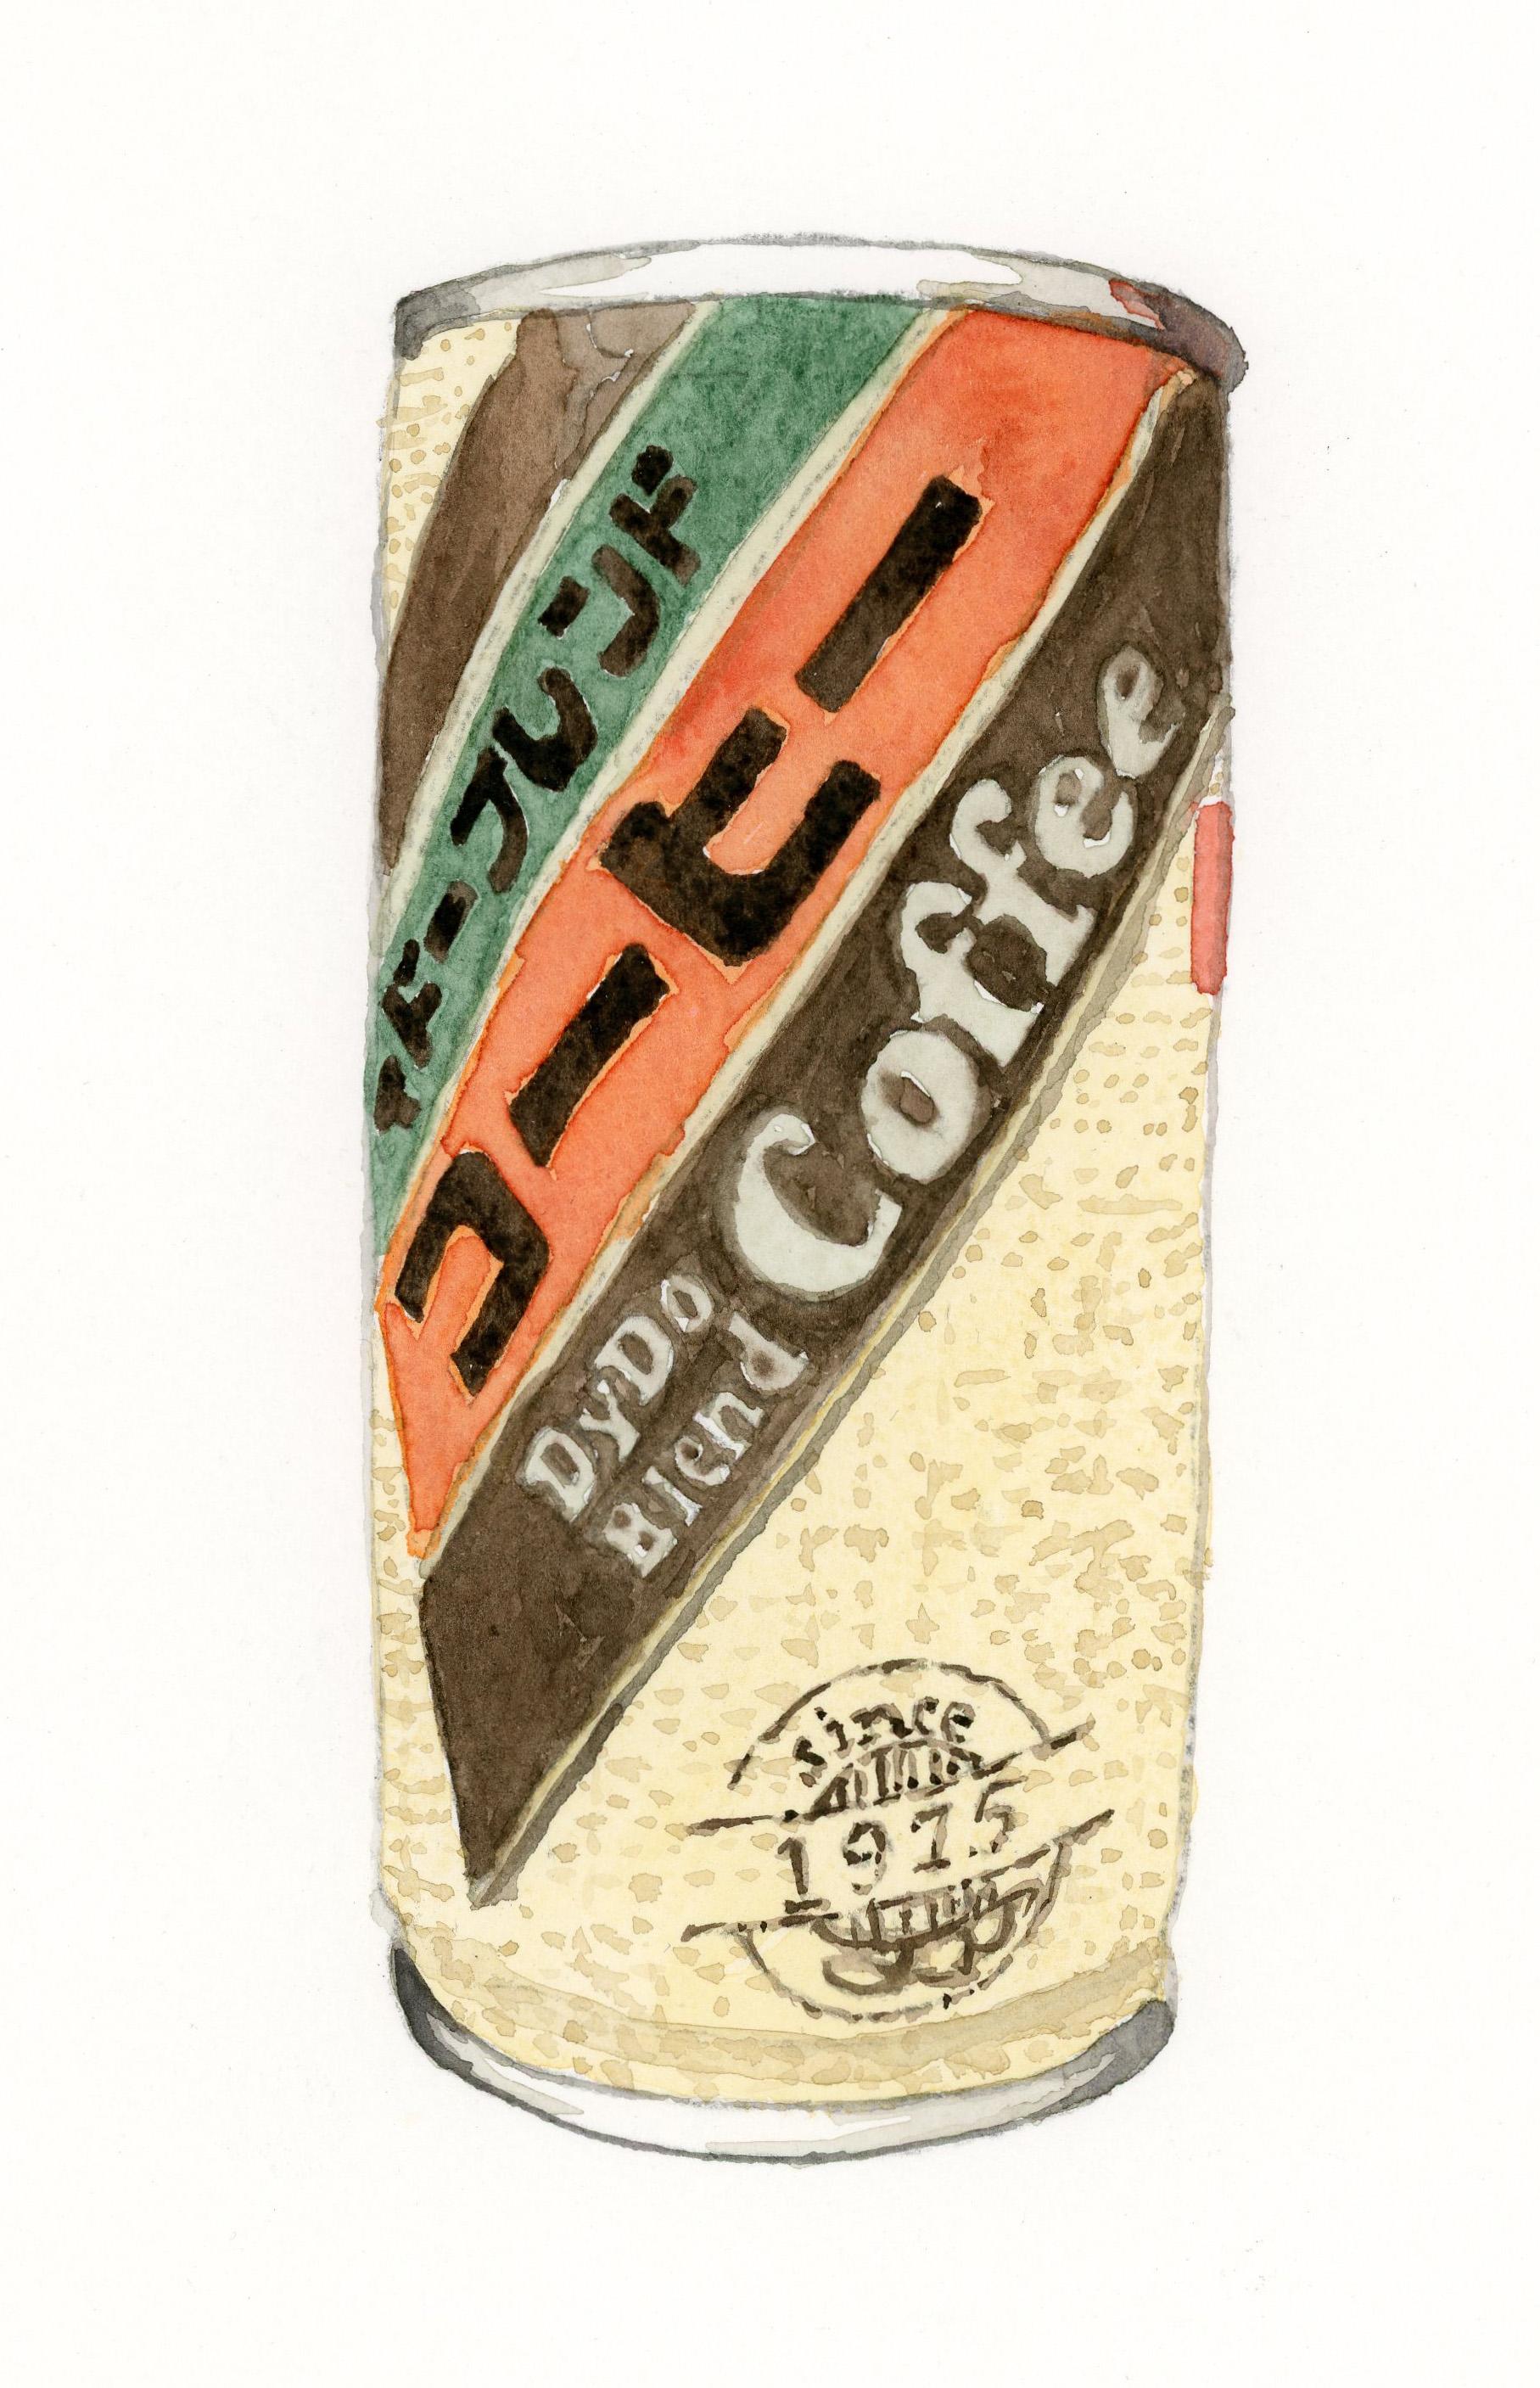 DyDo Blend Coffee